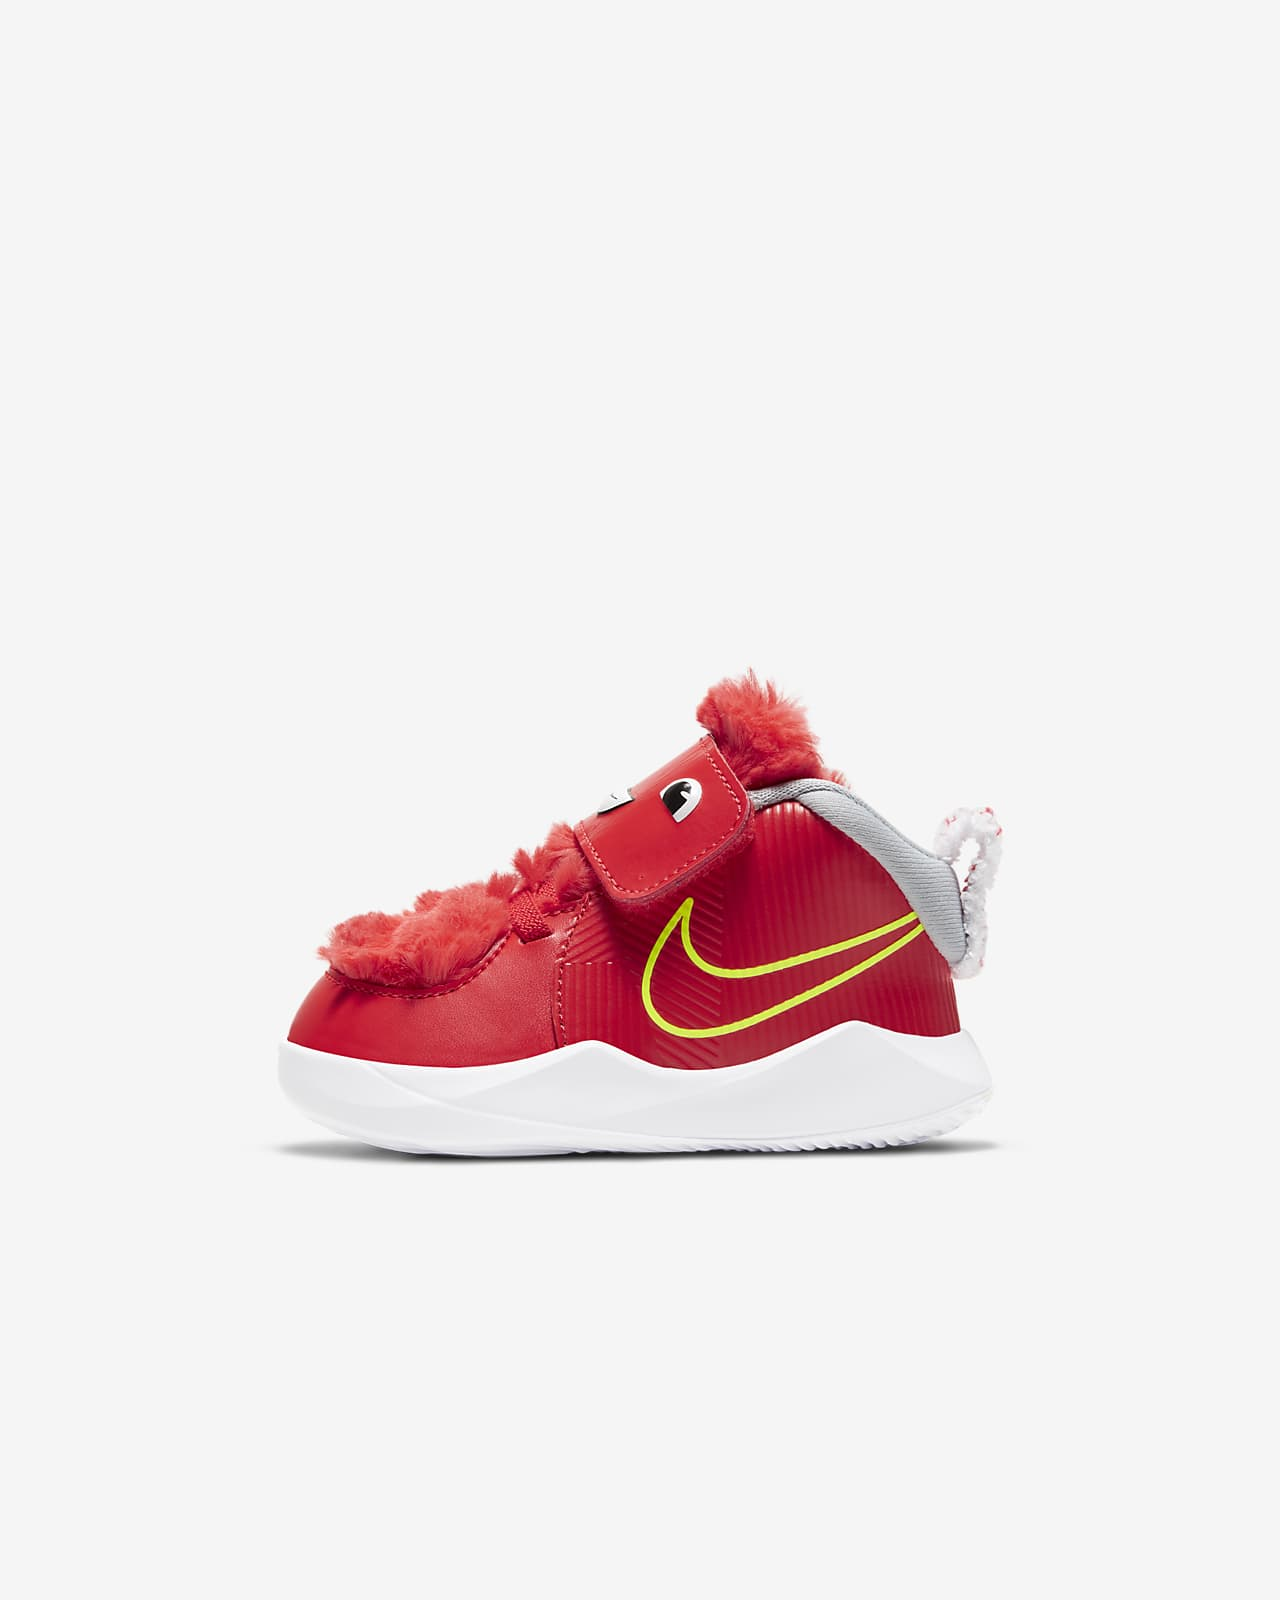 Calzado para bebé e infantil Nike Team Hustle D 9 Fast n Furry